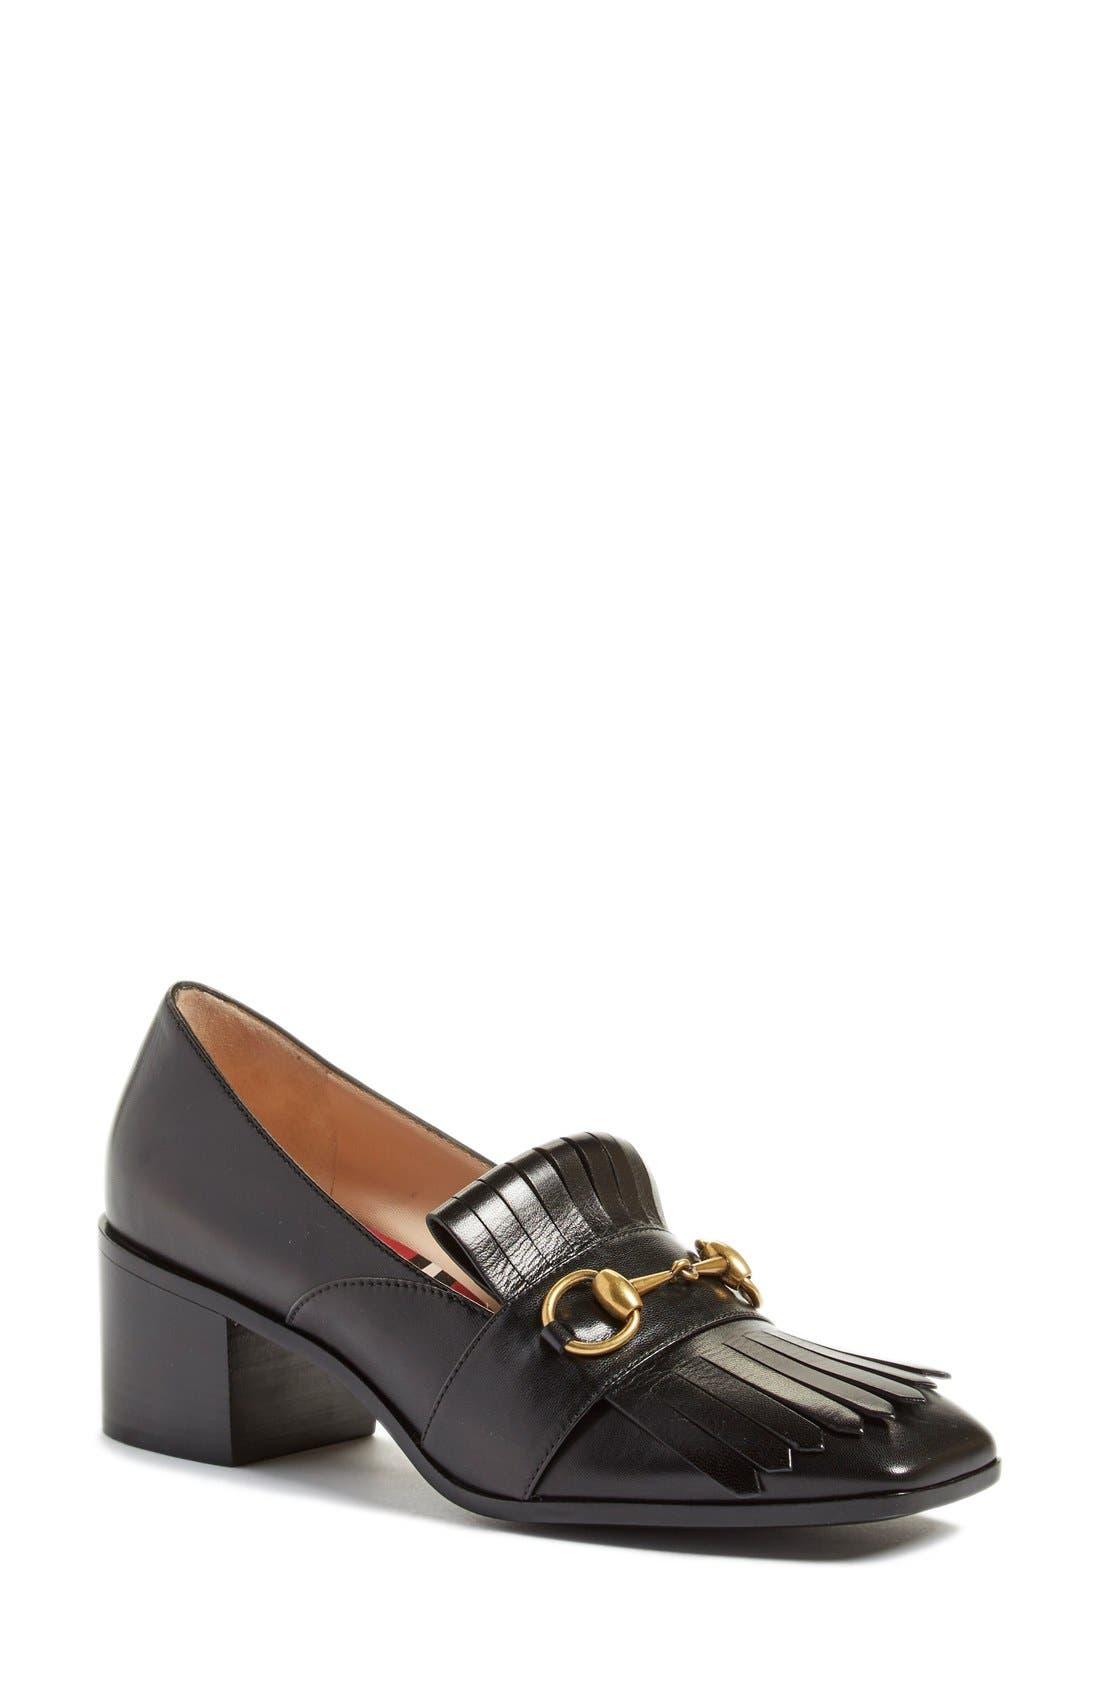 'Polly' Block Heel Pump,                         Main,                         color, Black Leather